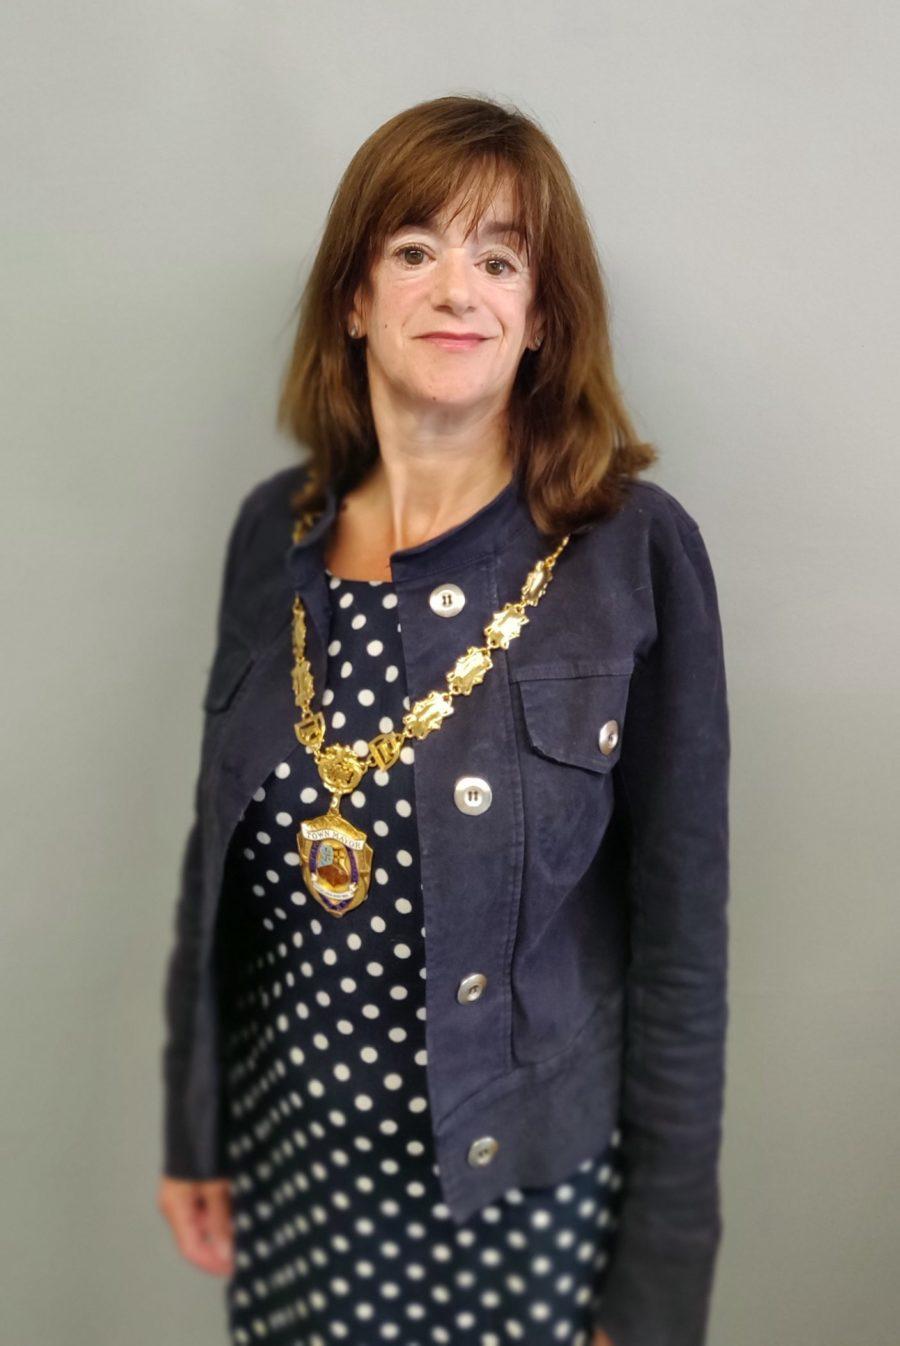 A photo of the Mayor of Dawlish, Alison Foden